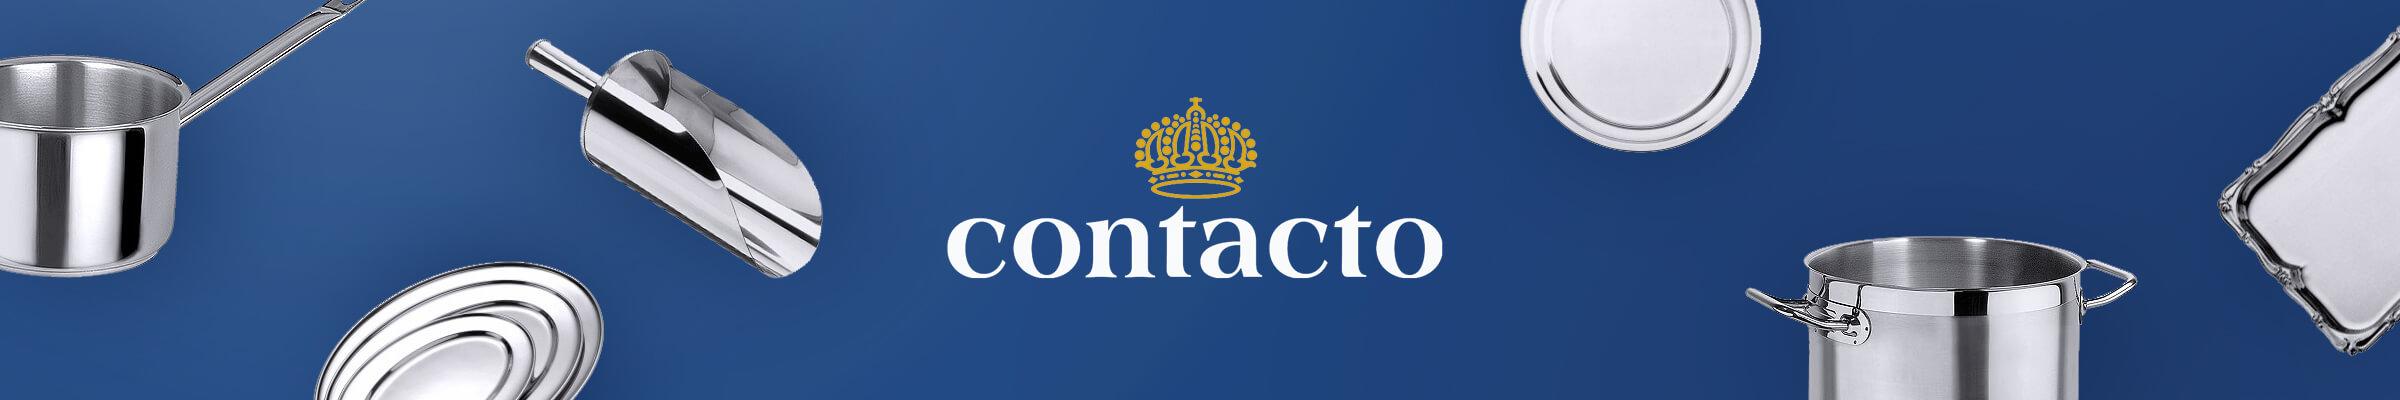 Contacto Online Shop